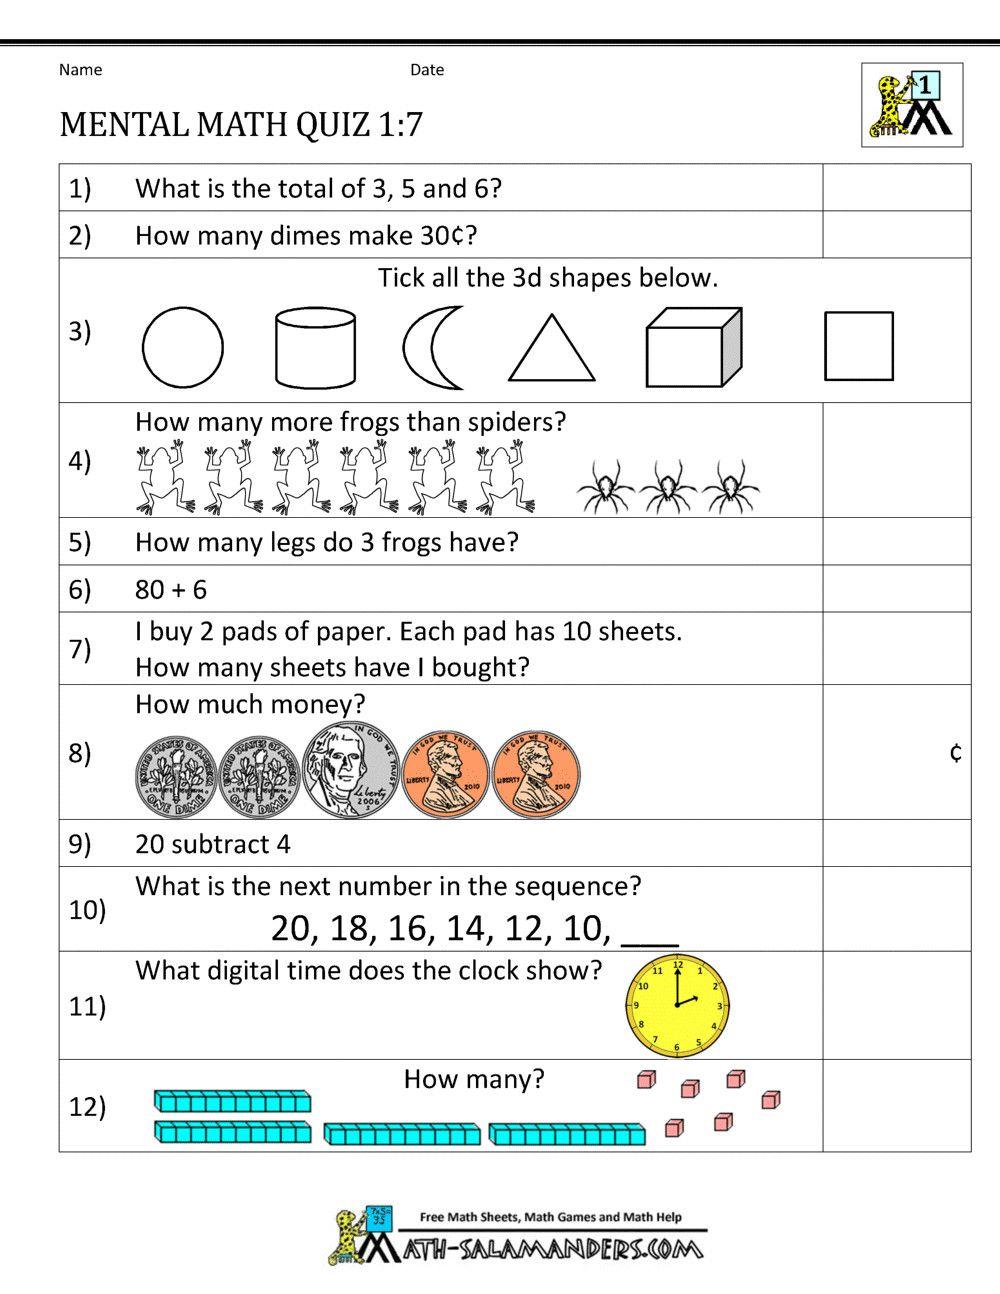 3 Subtraction Worksheets For Grade 1 First Grade Mental Math Worksheets In 2020 Mental Maths Worksheets Math Worksheets Year 7 Maths Worksheets [ 1294 x 1000 Pixel ]